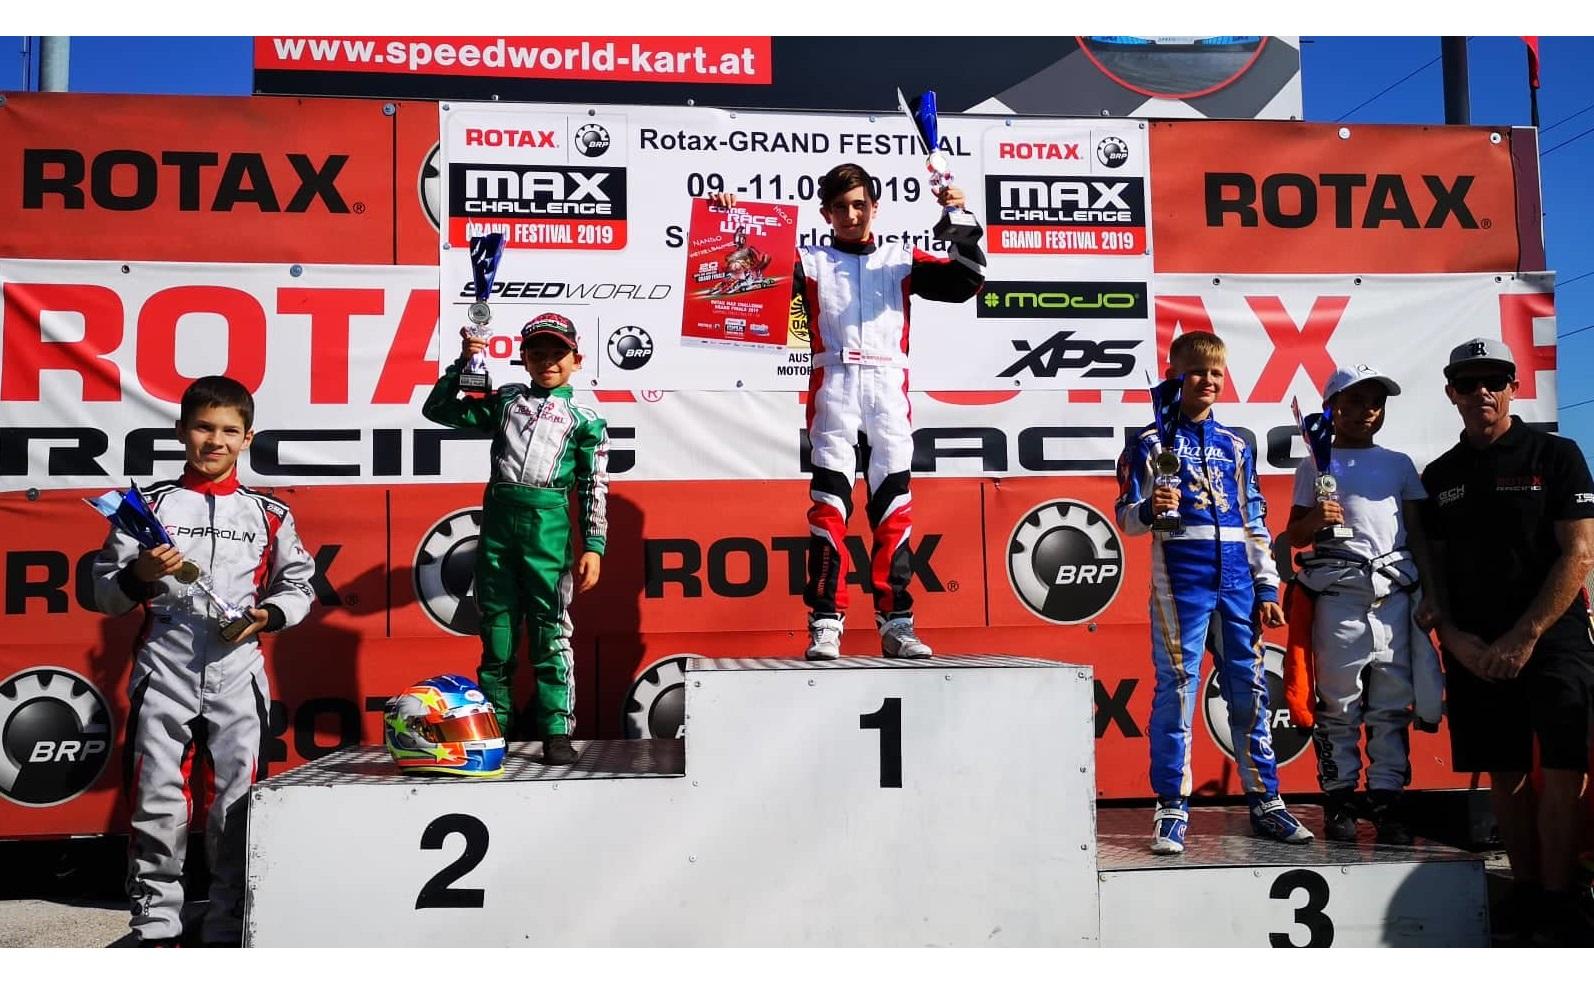 Christian Costoya subcampeón del Rotax Grand Festival 2019